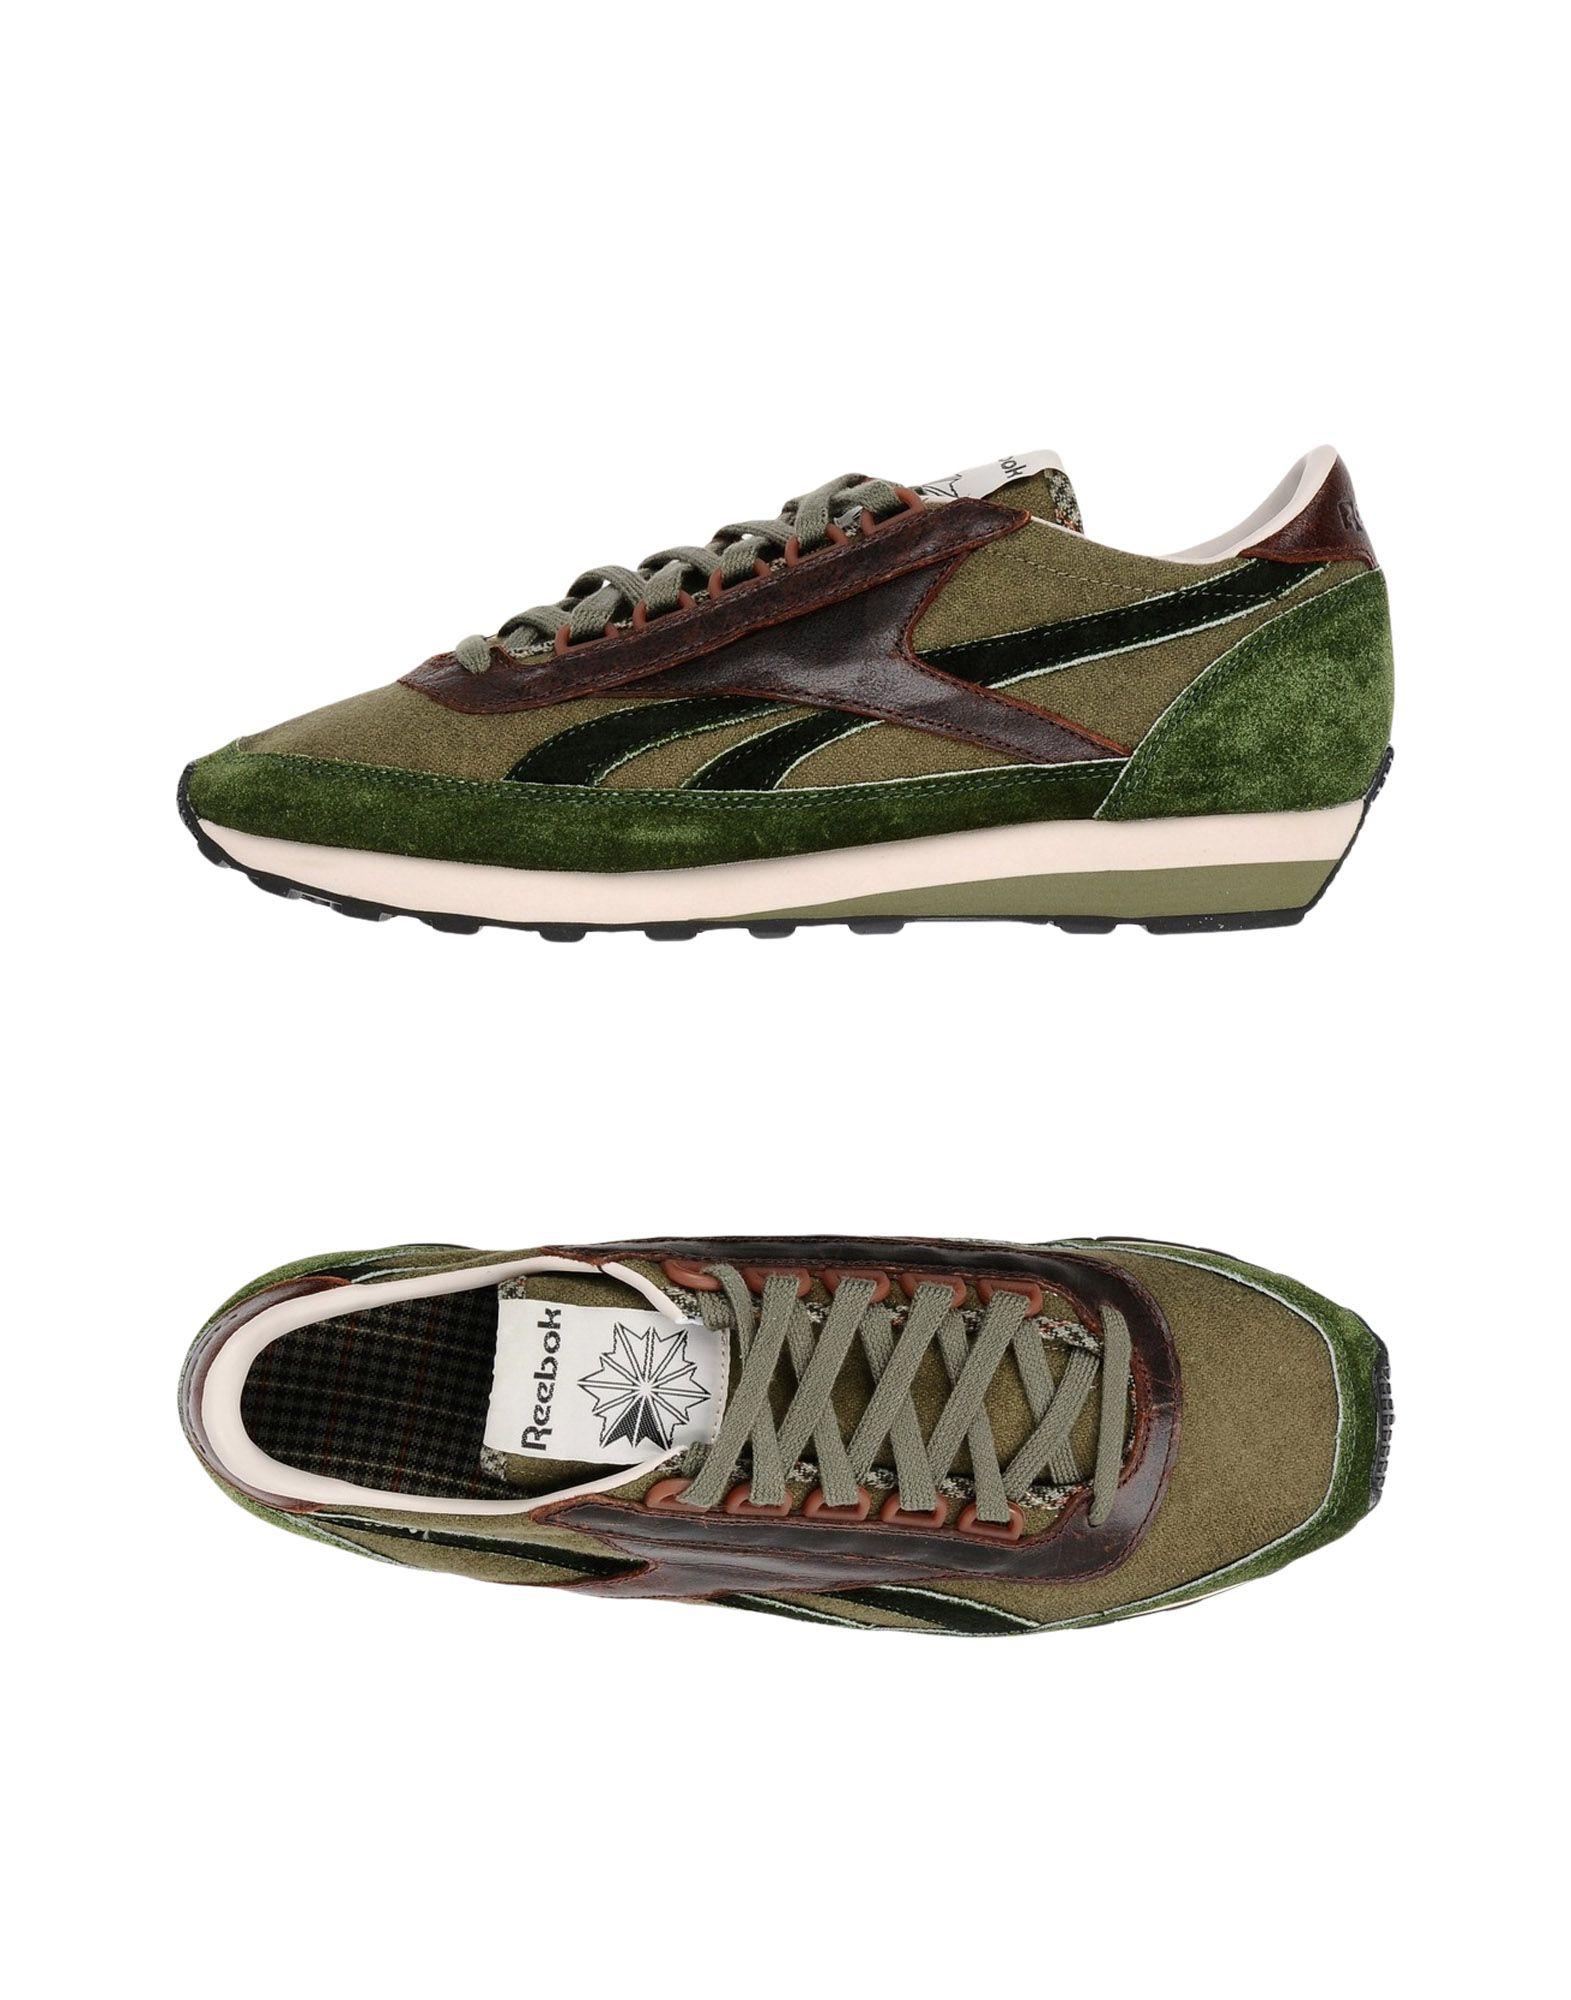 Sneakers Reebok Aztec Cb - Homme - Sneakers Reebok sur